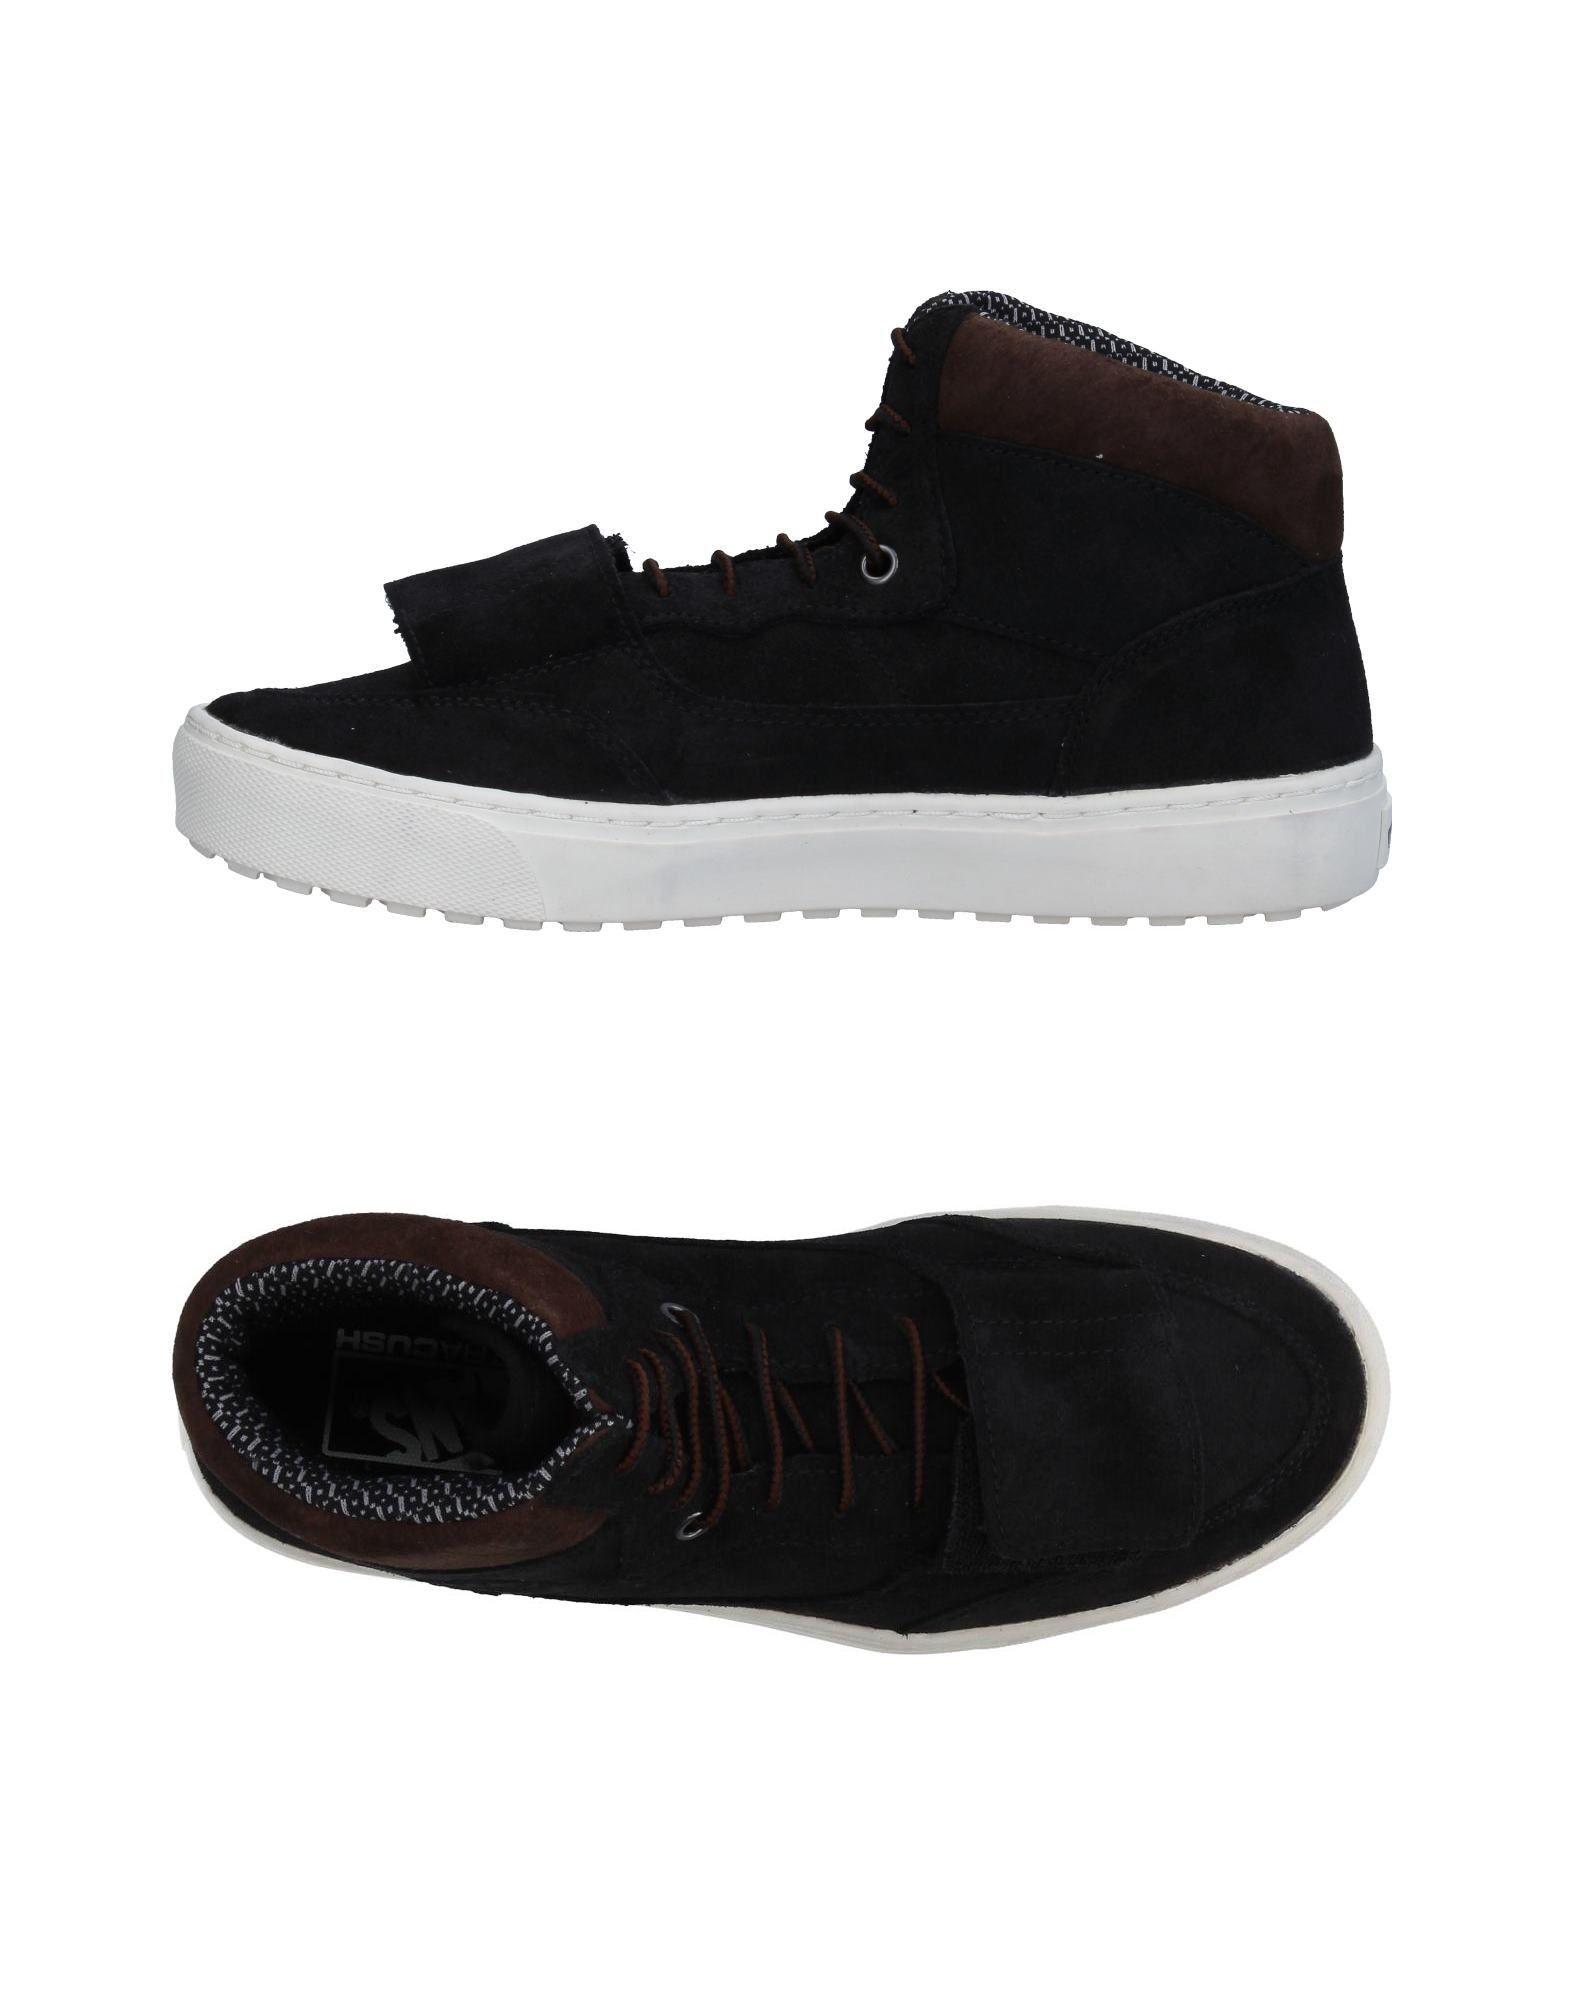 Sneakers Vans Homme - Sneakers Vans  Noir Super rabais